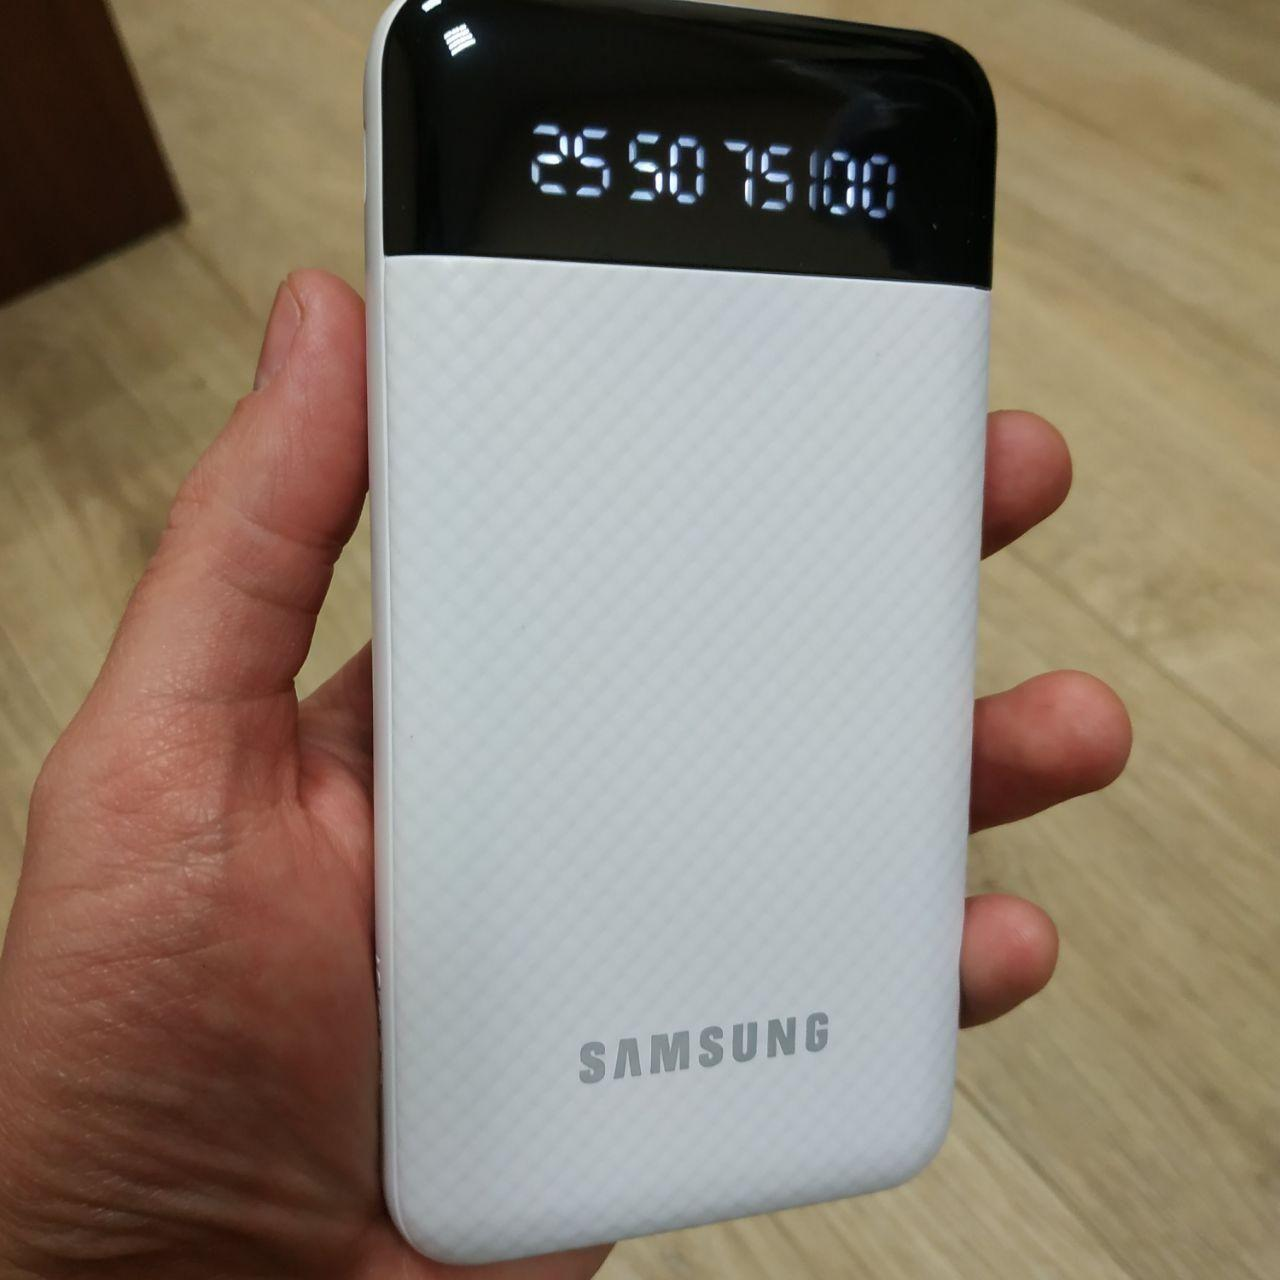 Power Bank Samsung 20000 mAh с фонариком повер банк внешний аккумулятор Самсунг реплика, фото 1